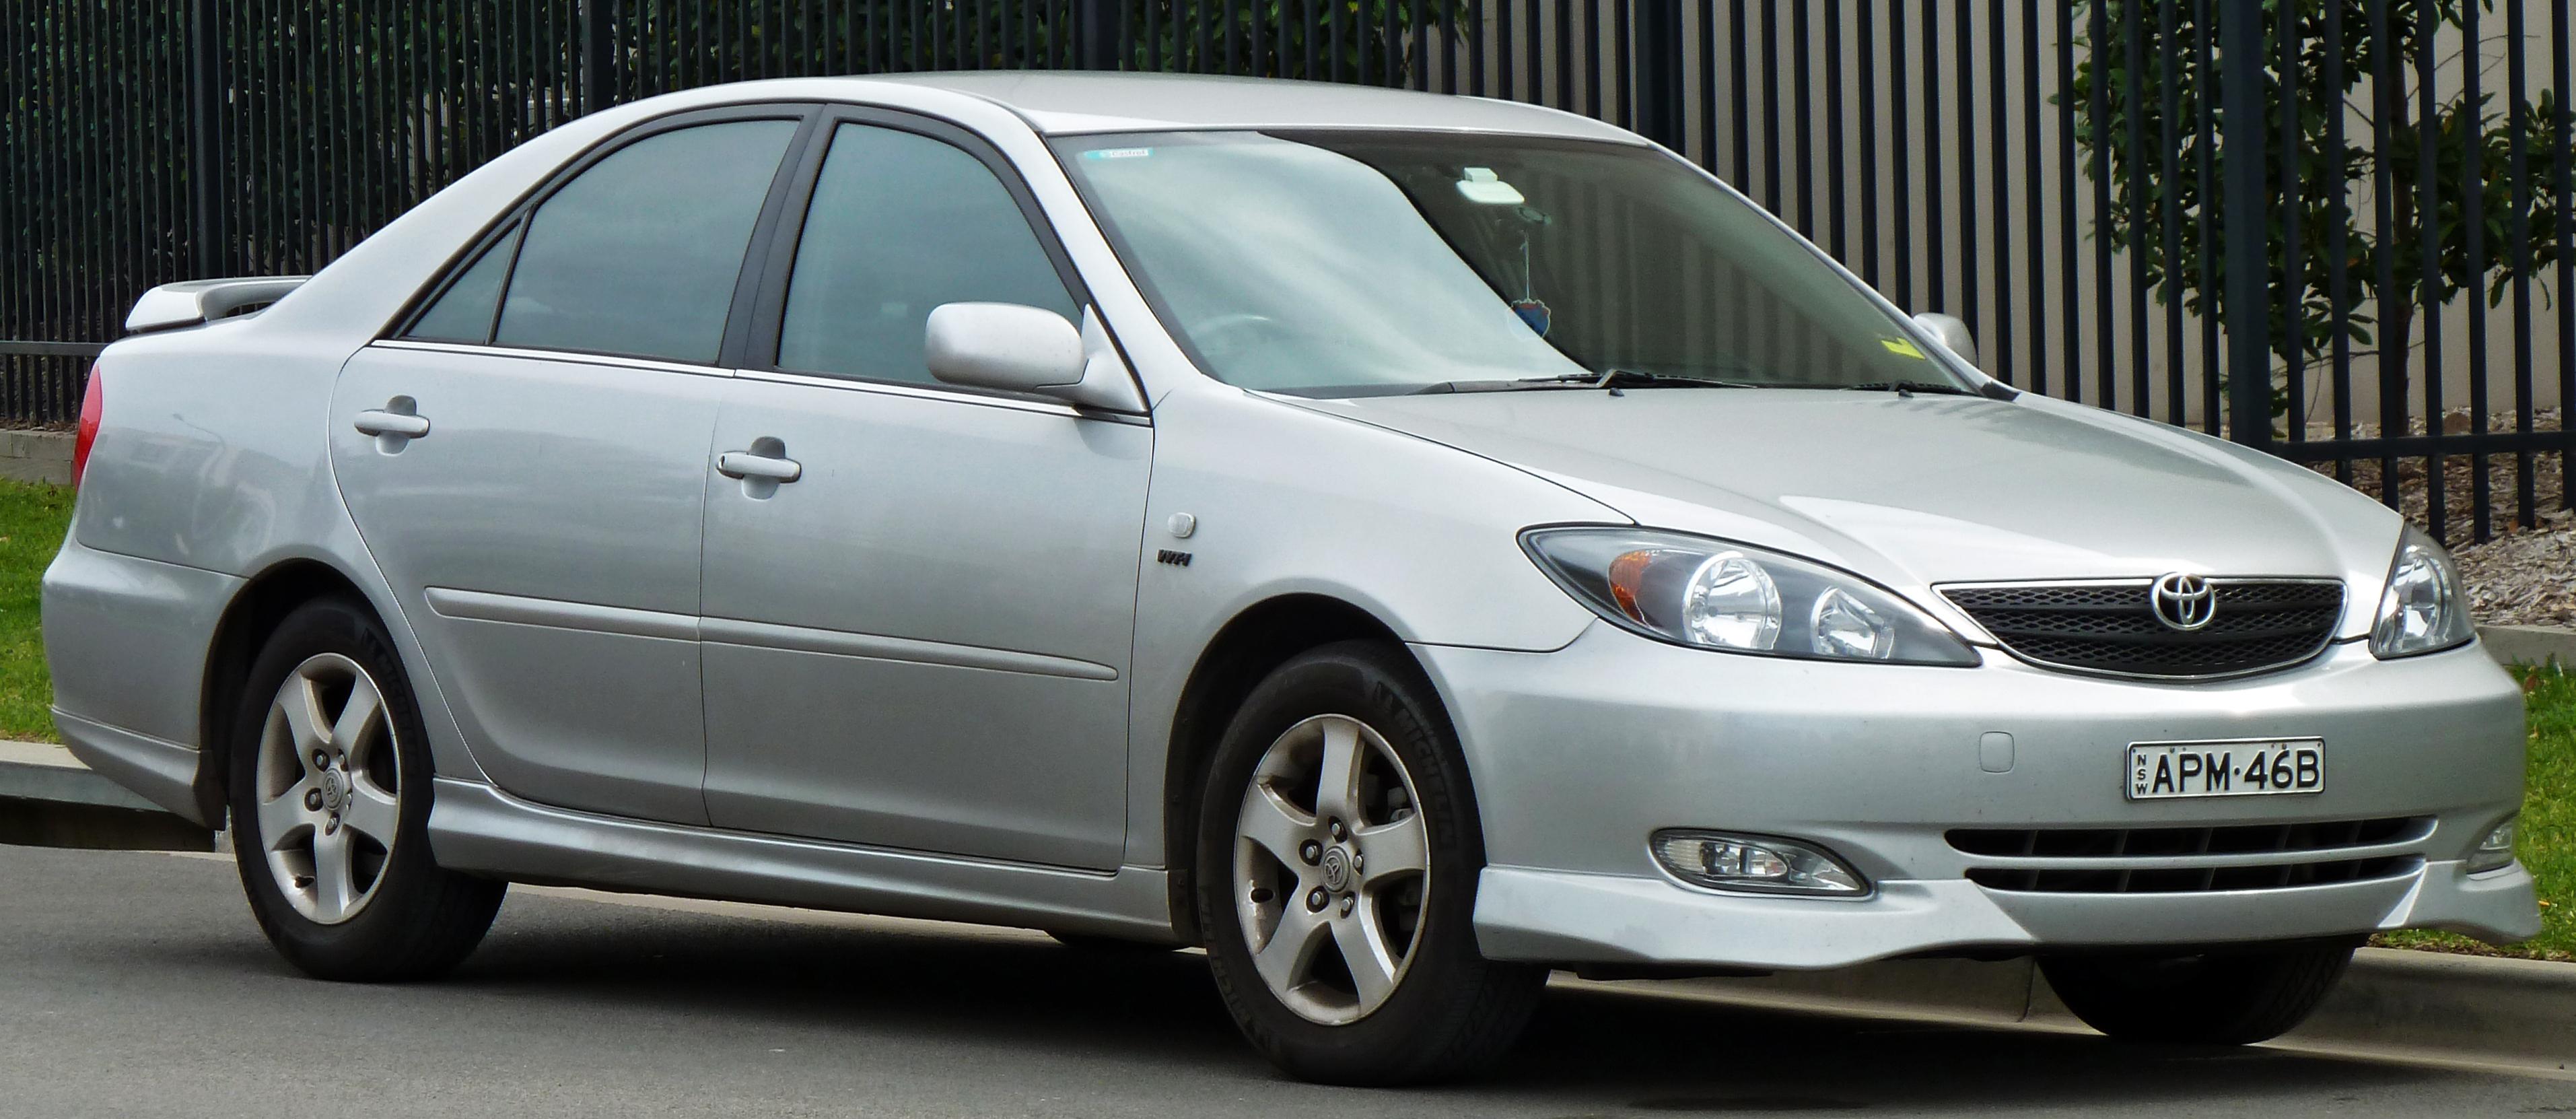 File:2002-2004 Toyota Camry (ACV36R) Sportivo sedan 04.jpg ...